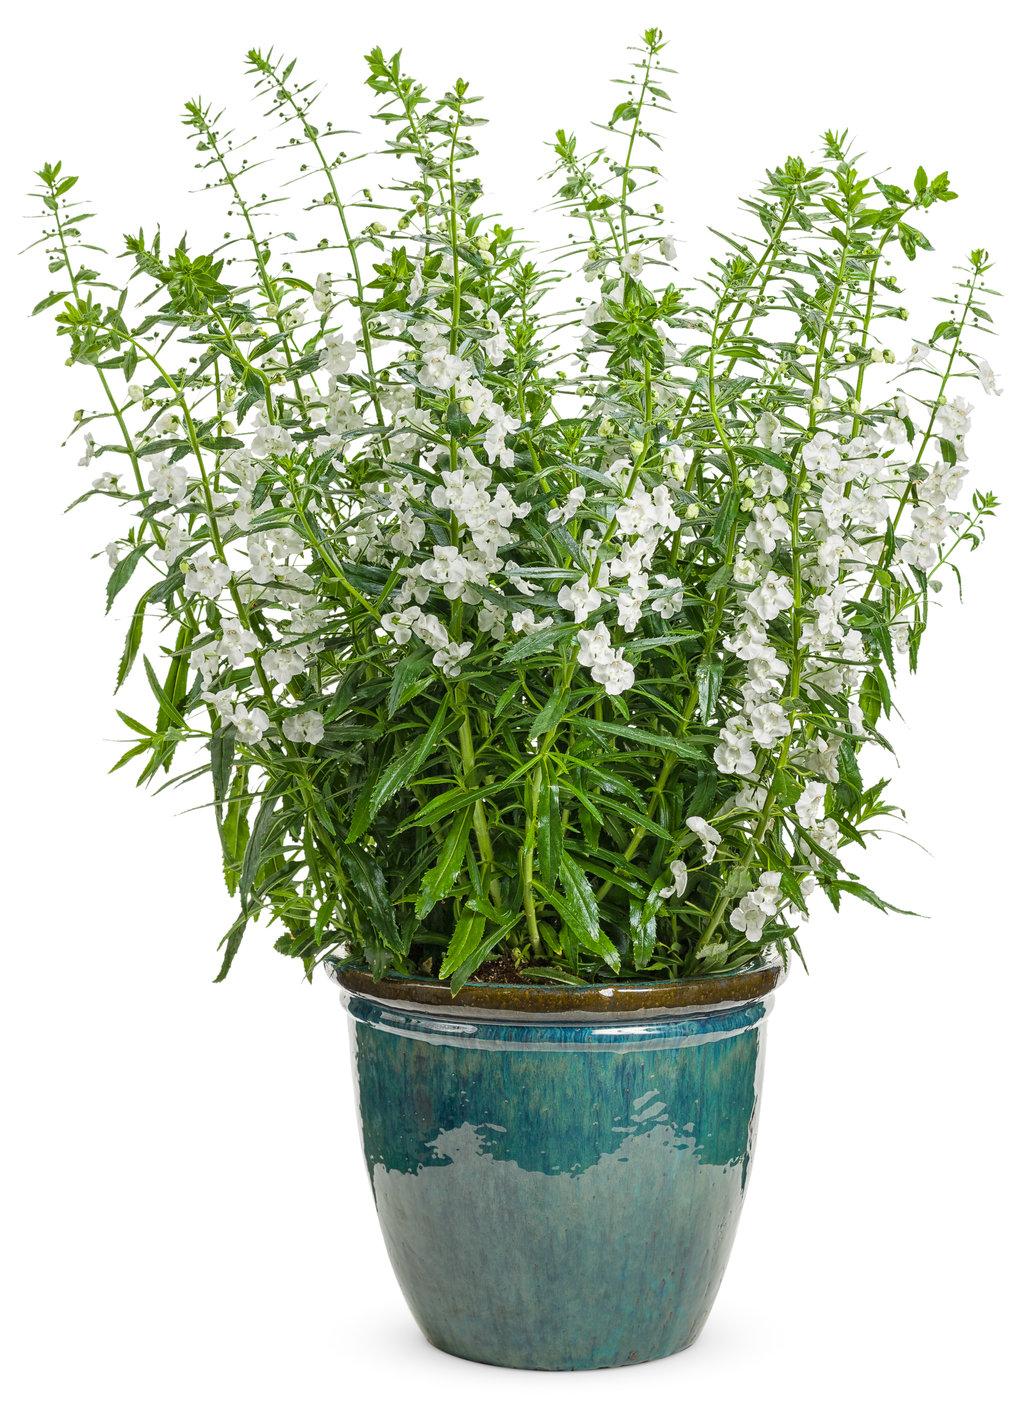 Plants In The Shade Garden Ideas